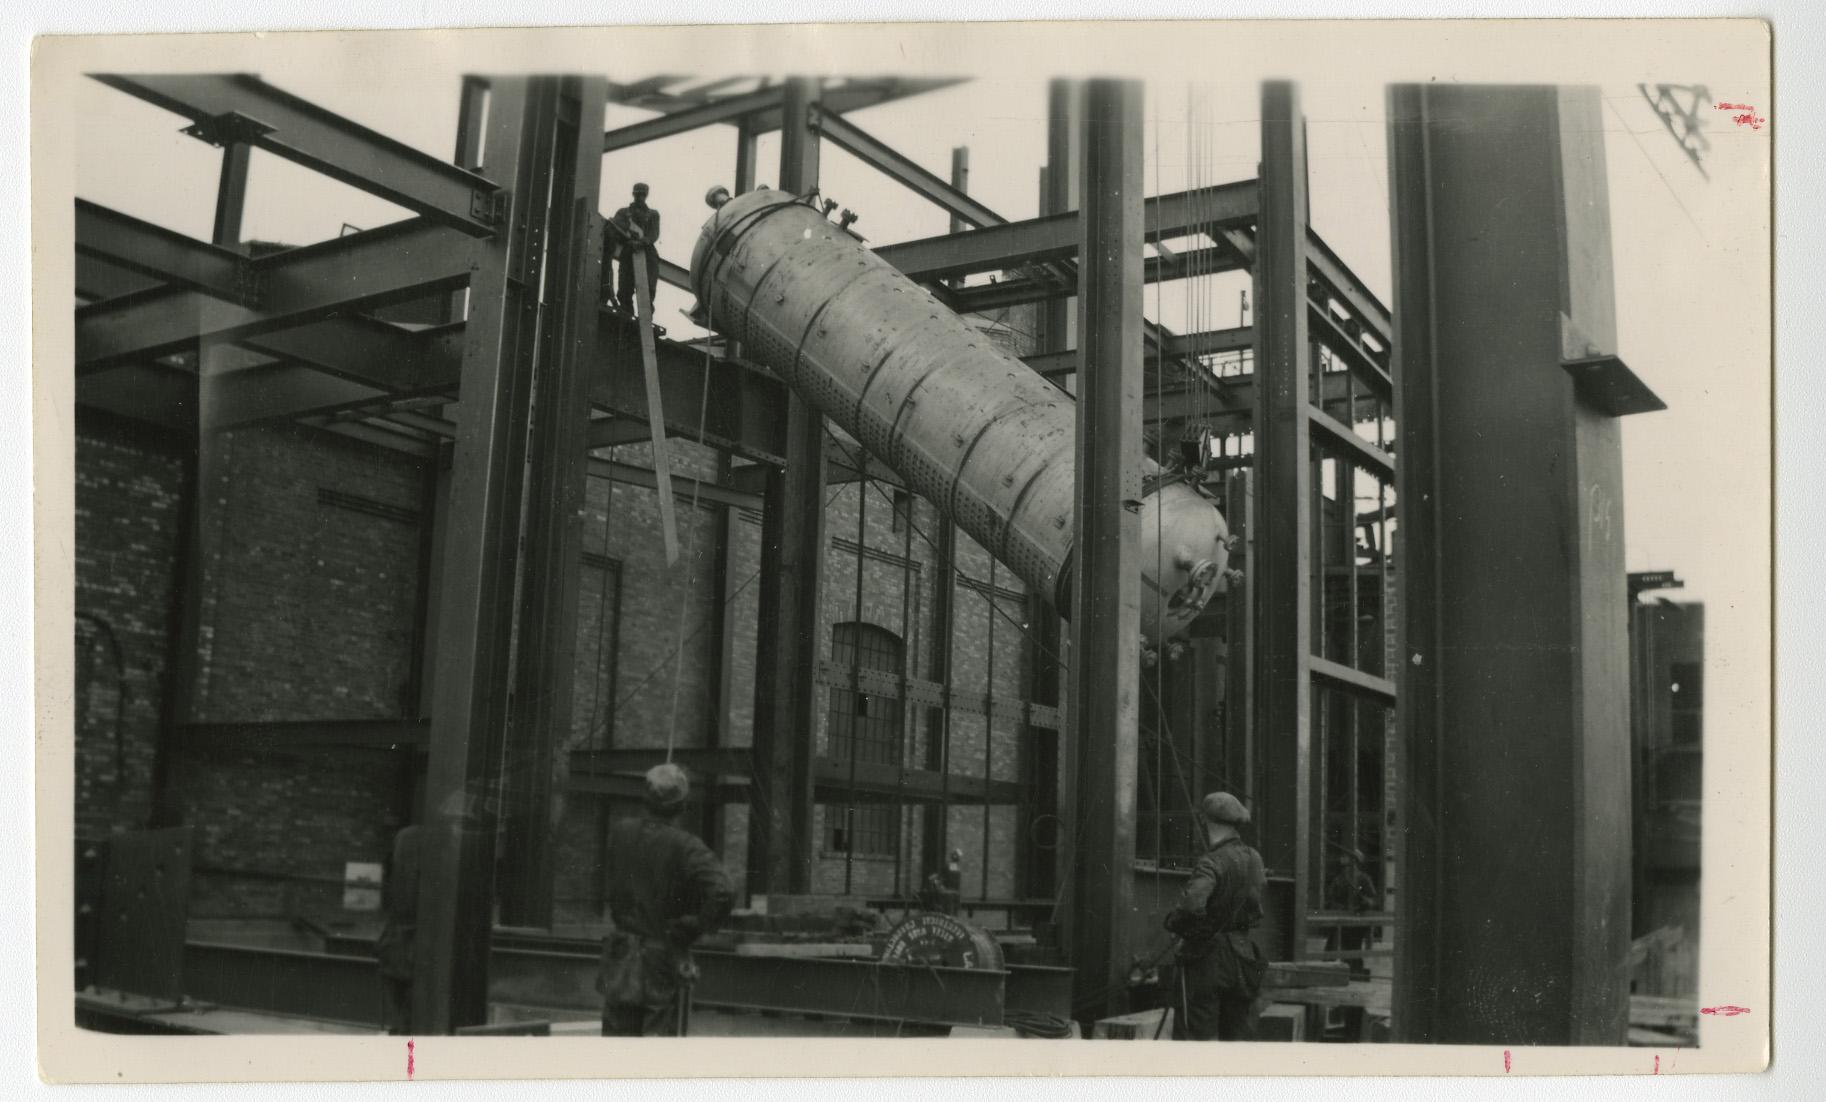 Installing a Steam Drum at Ocean Falls Generating Station, Ocean